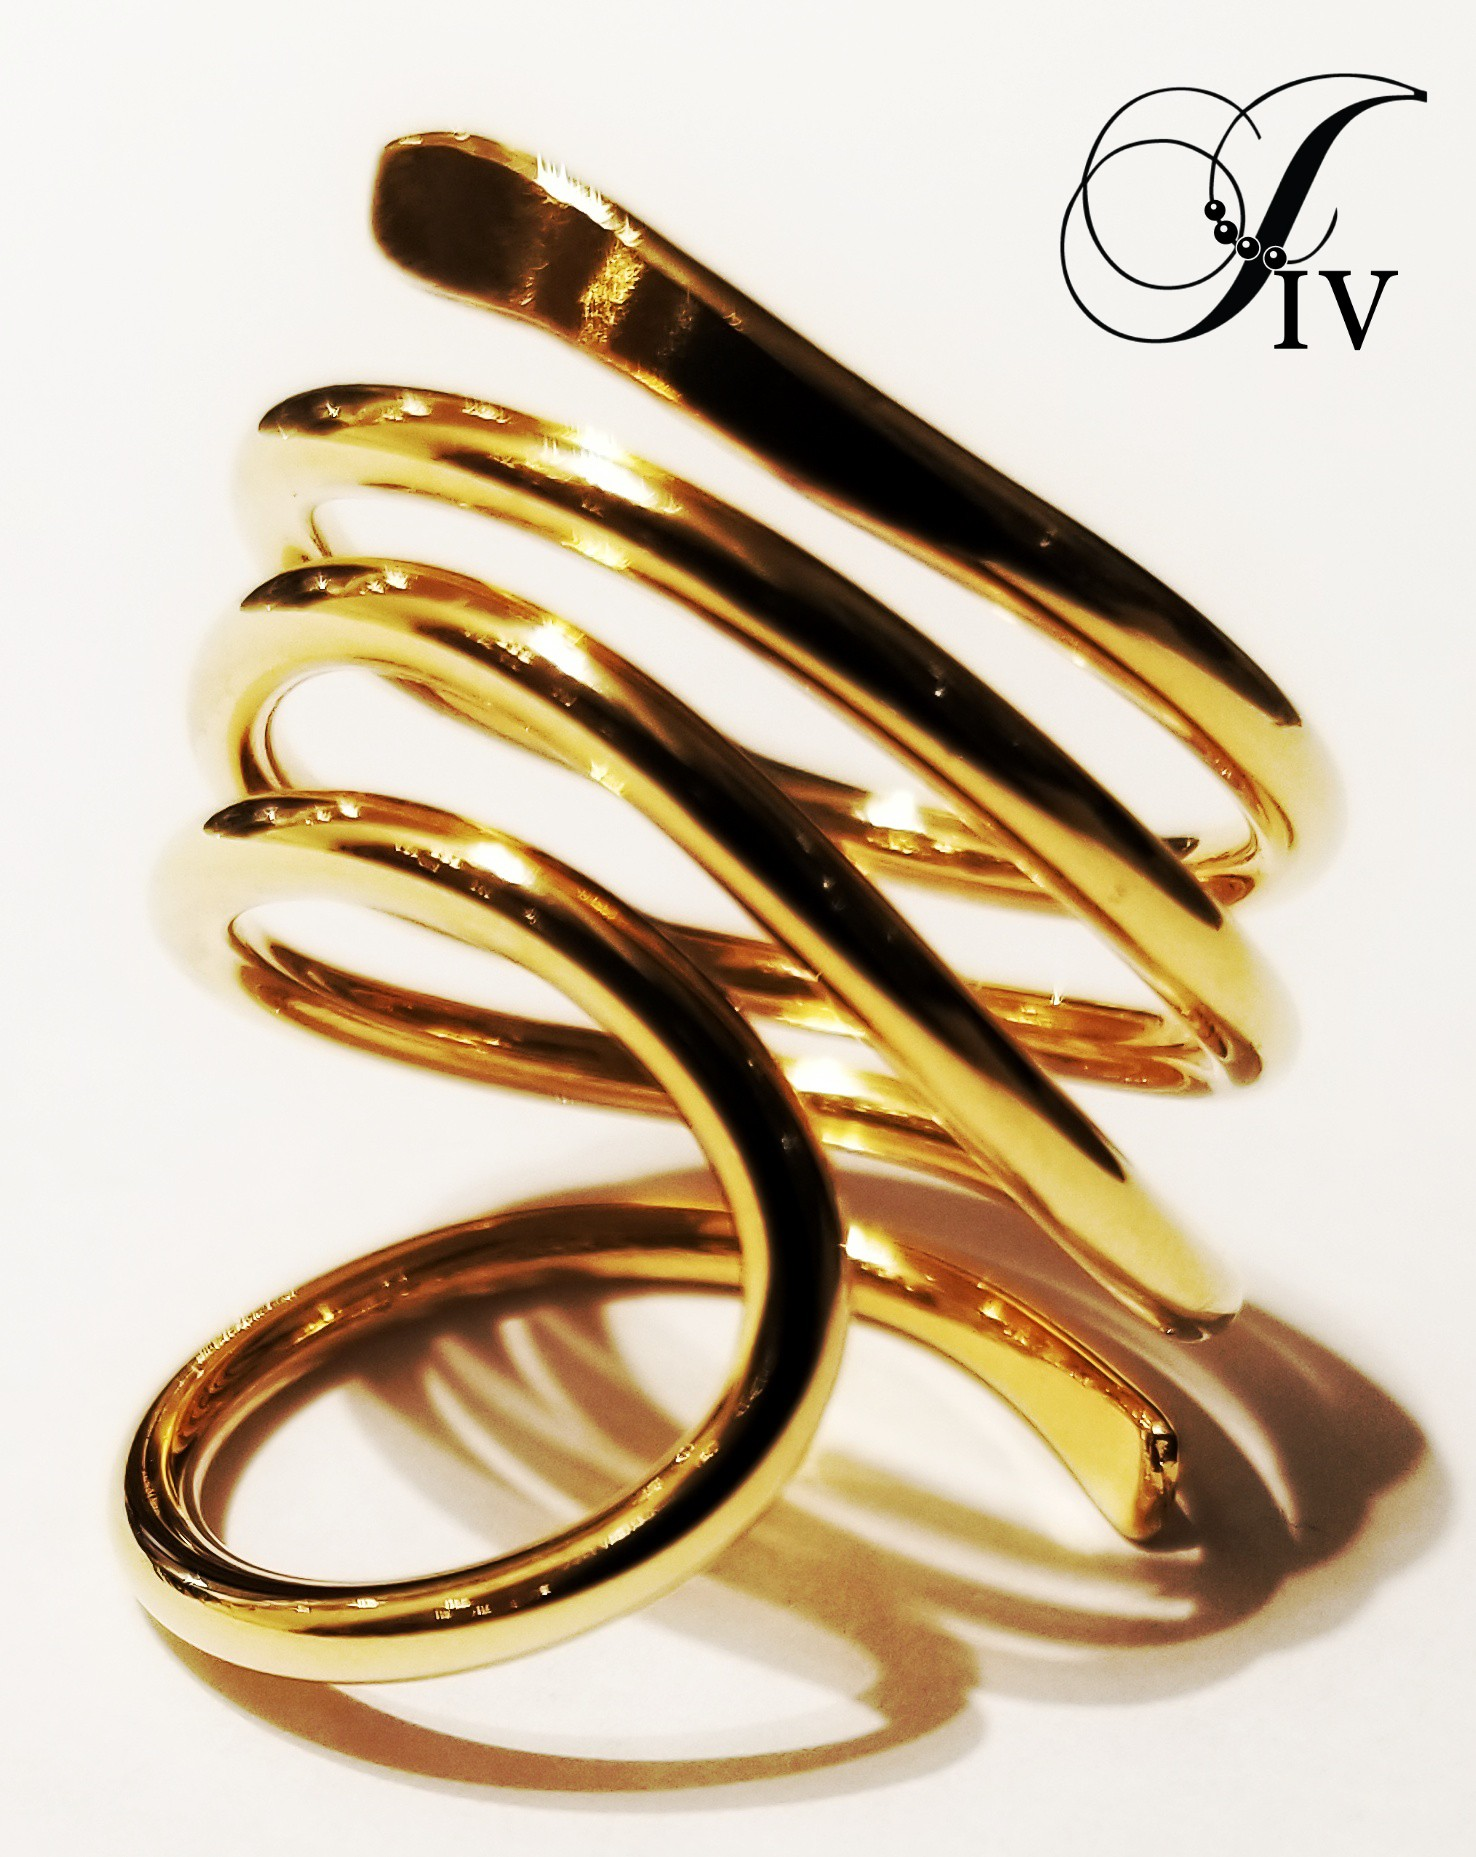 John Street jewelry